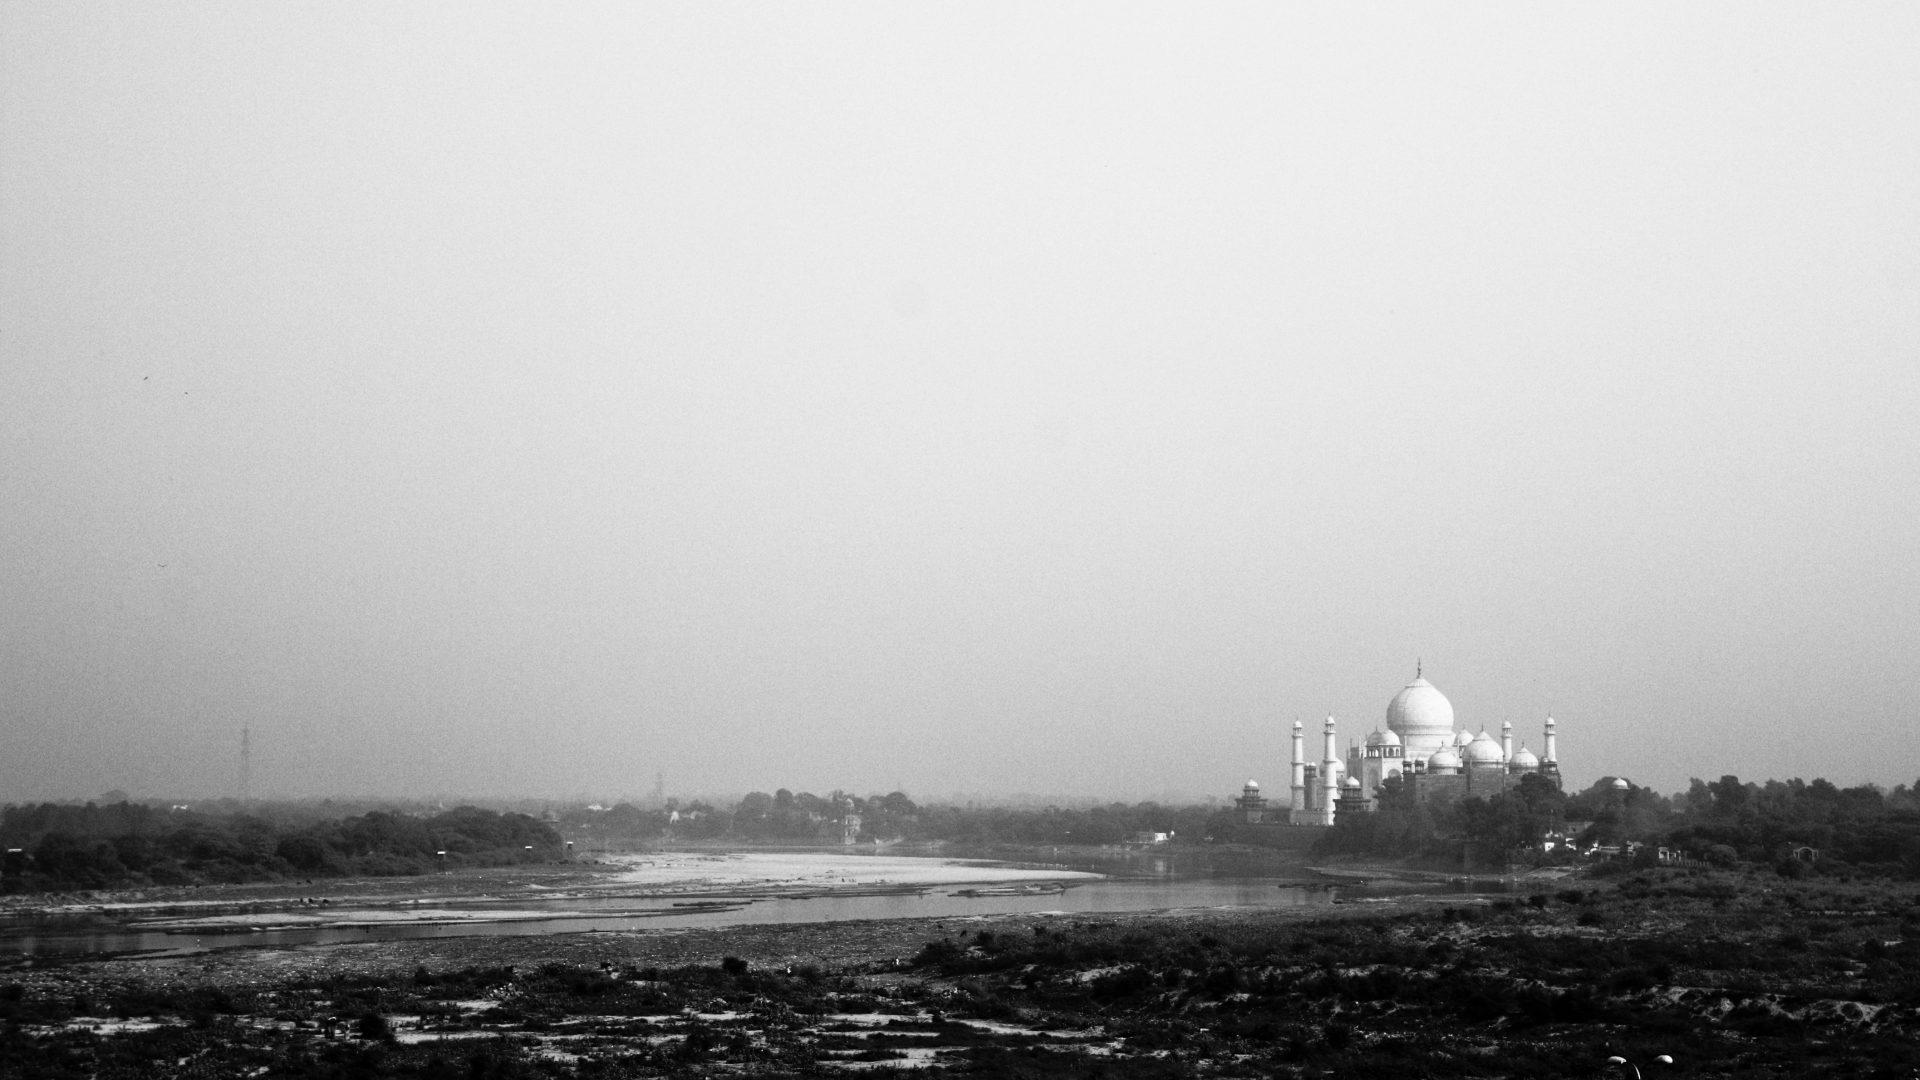 Beyond the Taj Mahal: Things to do in Agra